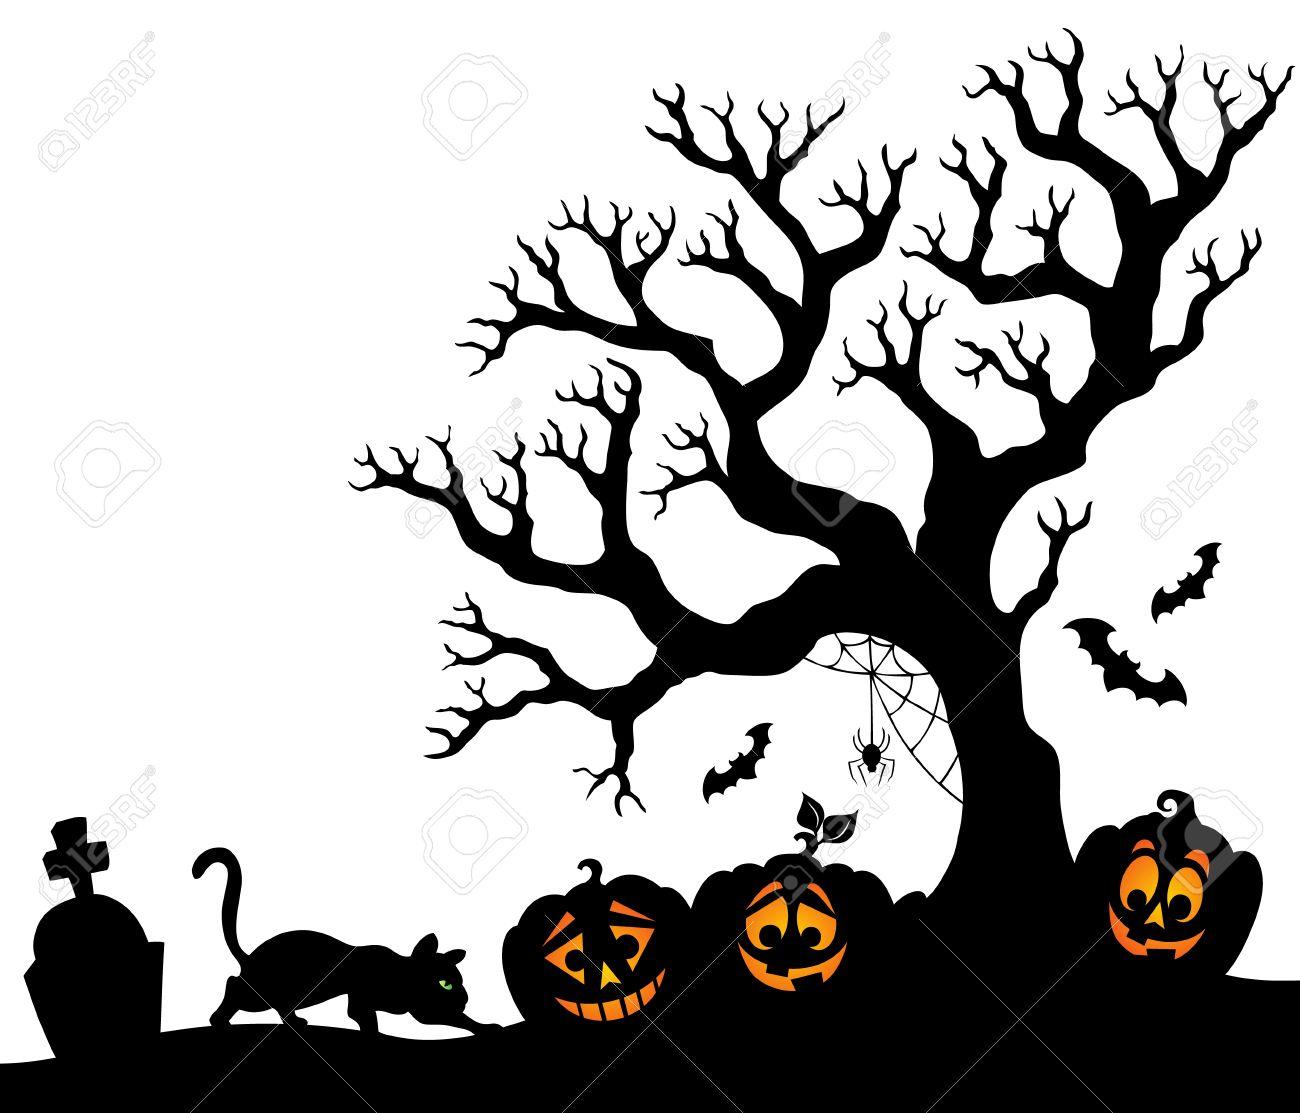 halloween tree silhouette royalty free cliparts vectors and stock rh 123rf com Halloween Pumpkin Clip Art Halloween Owl Clip Art